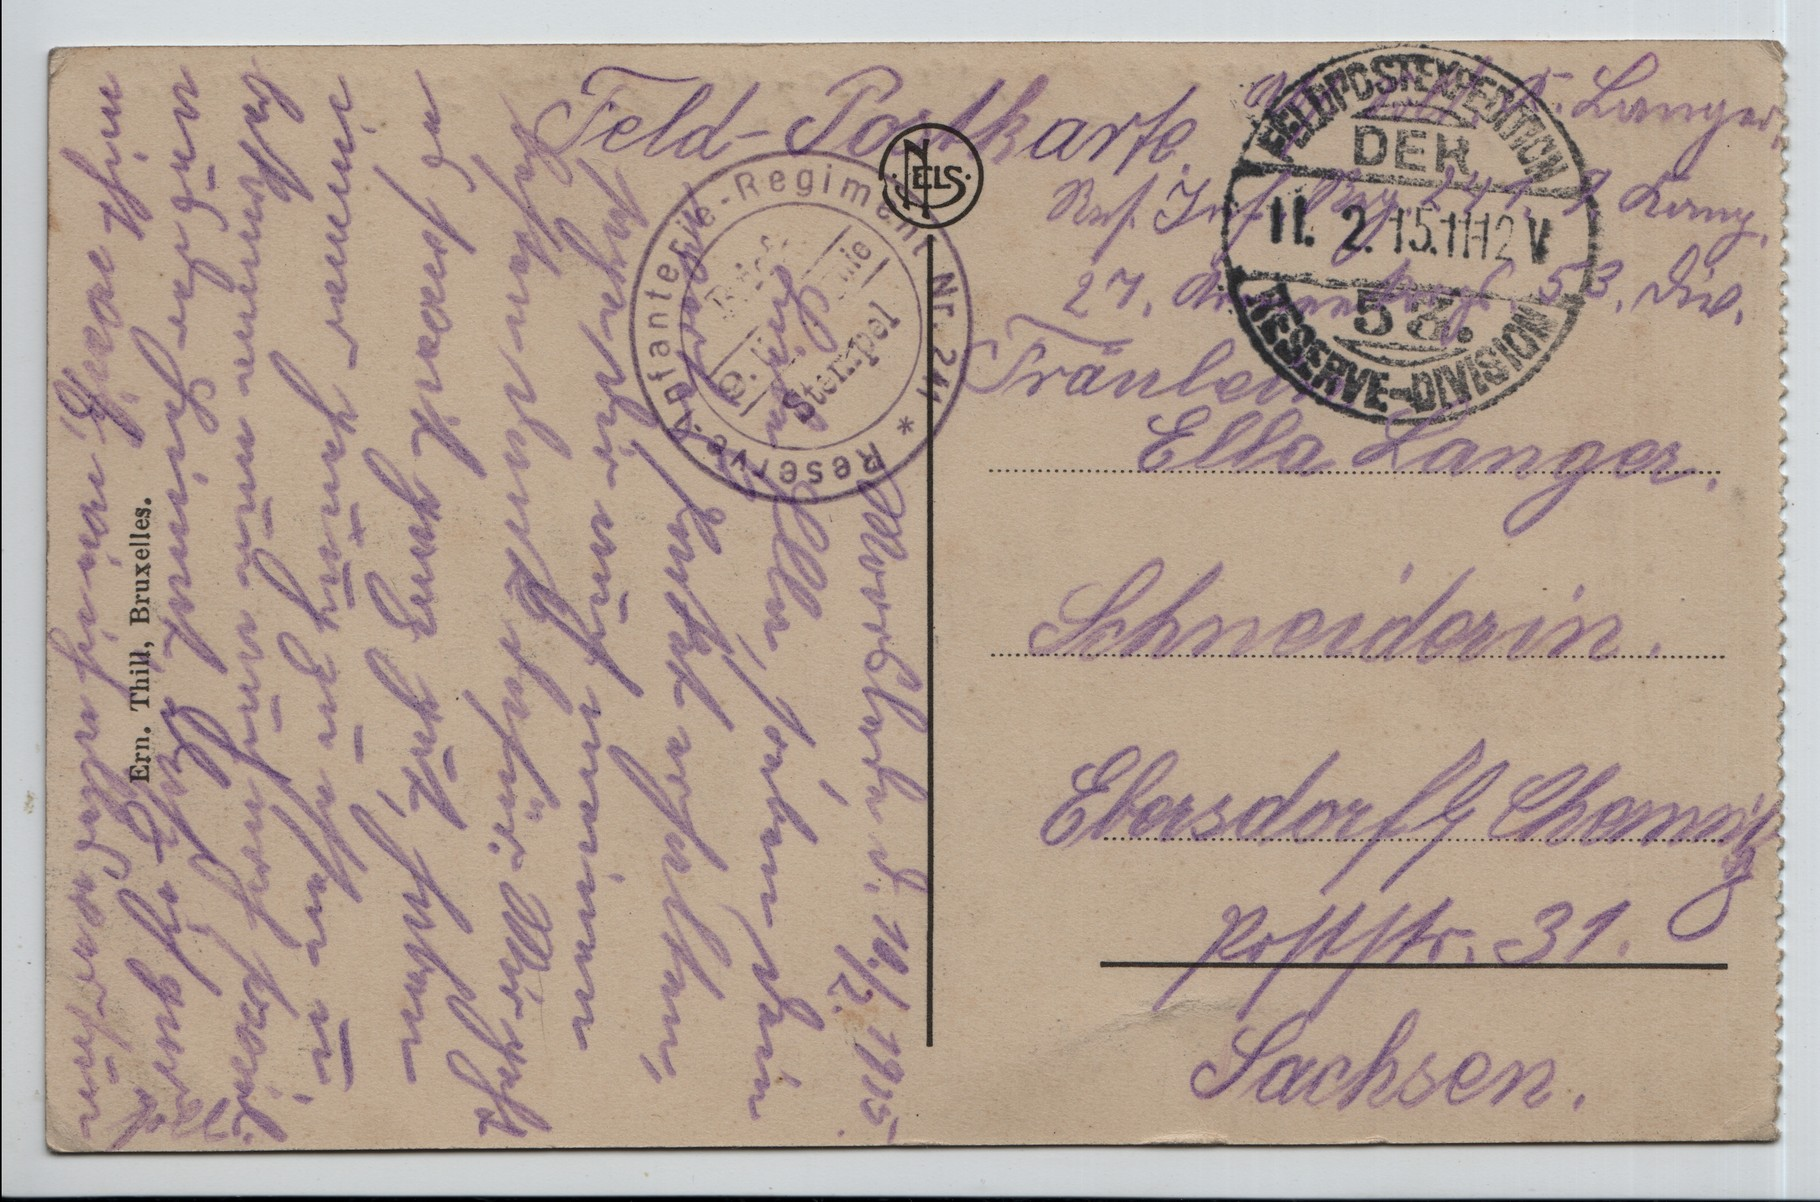 17. 11th Feb 1915